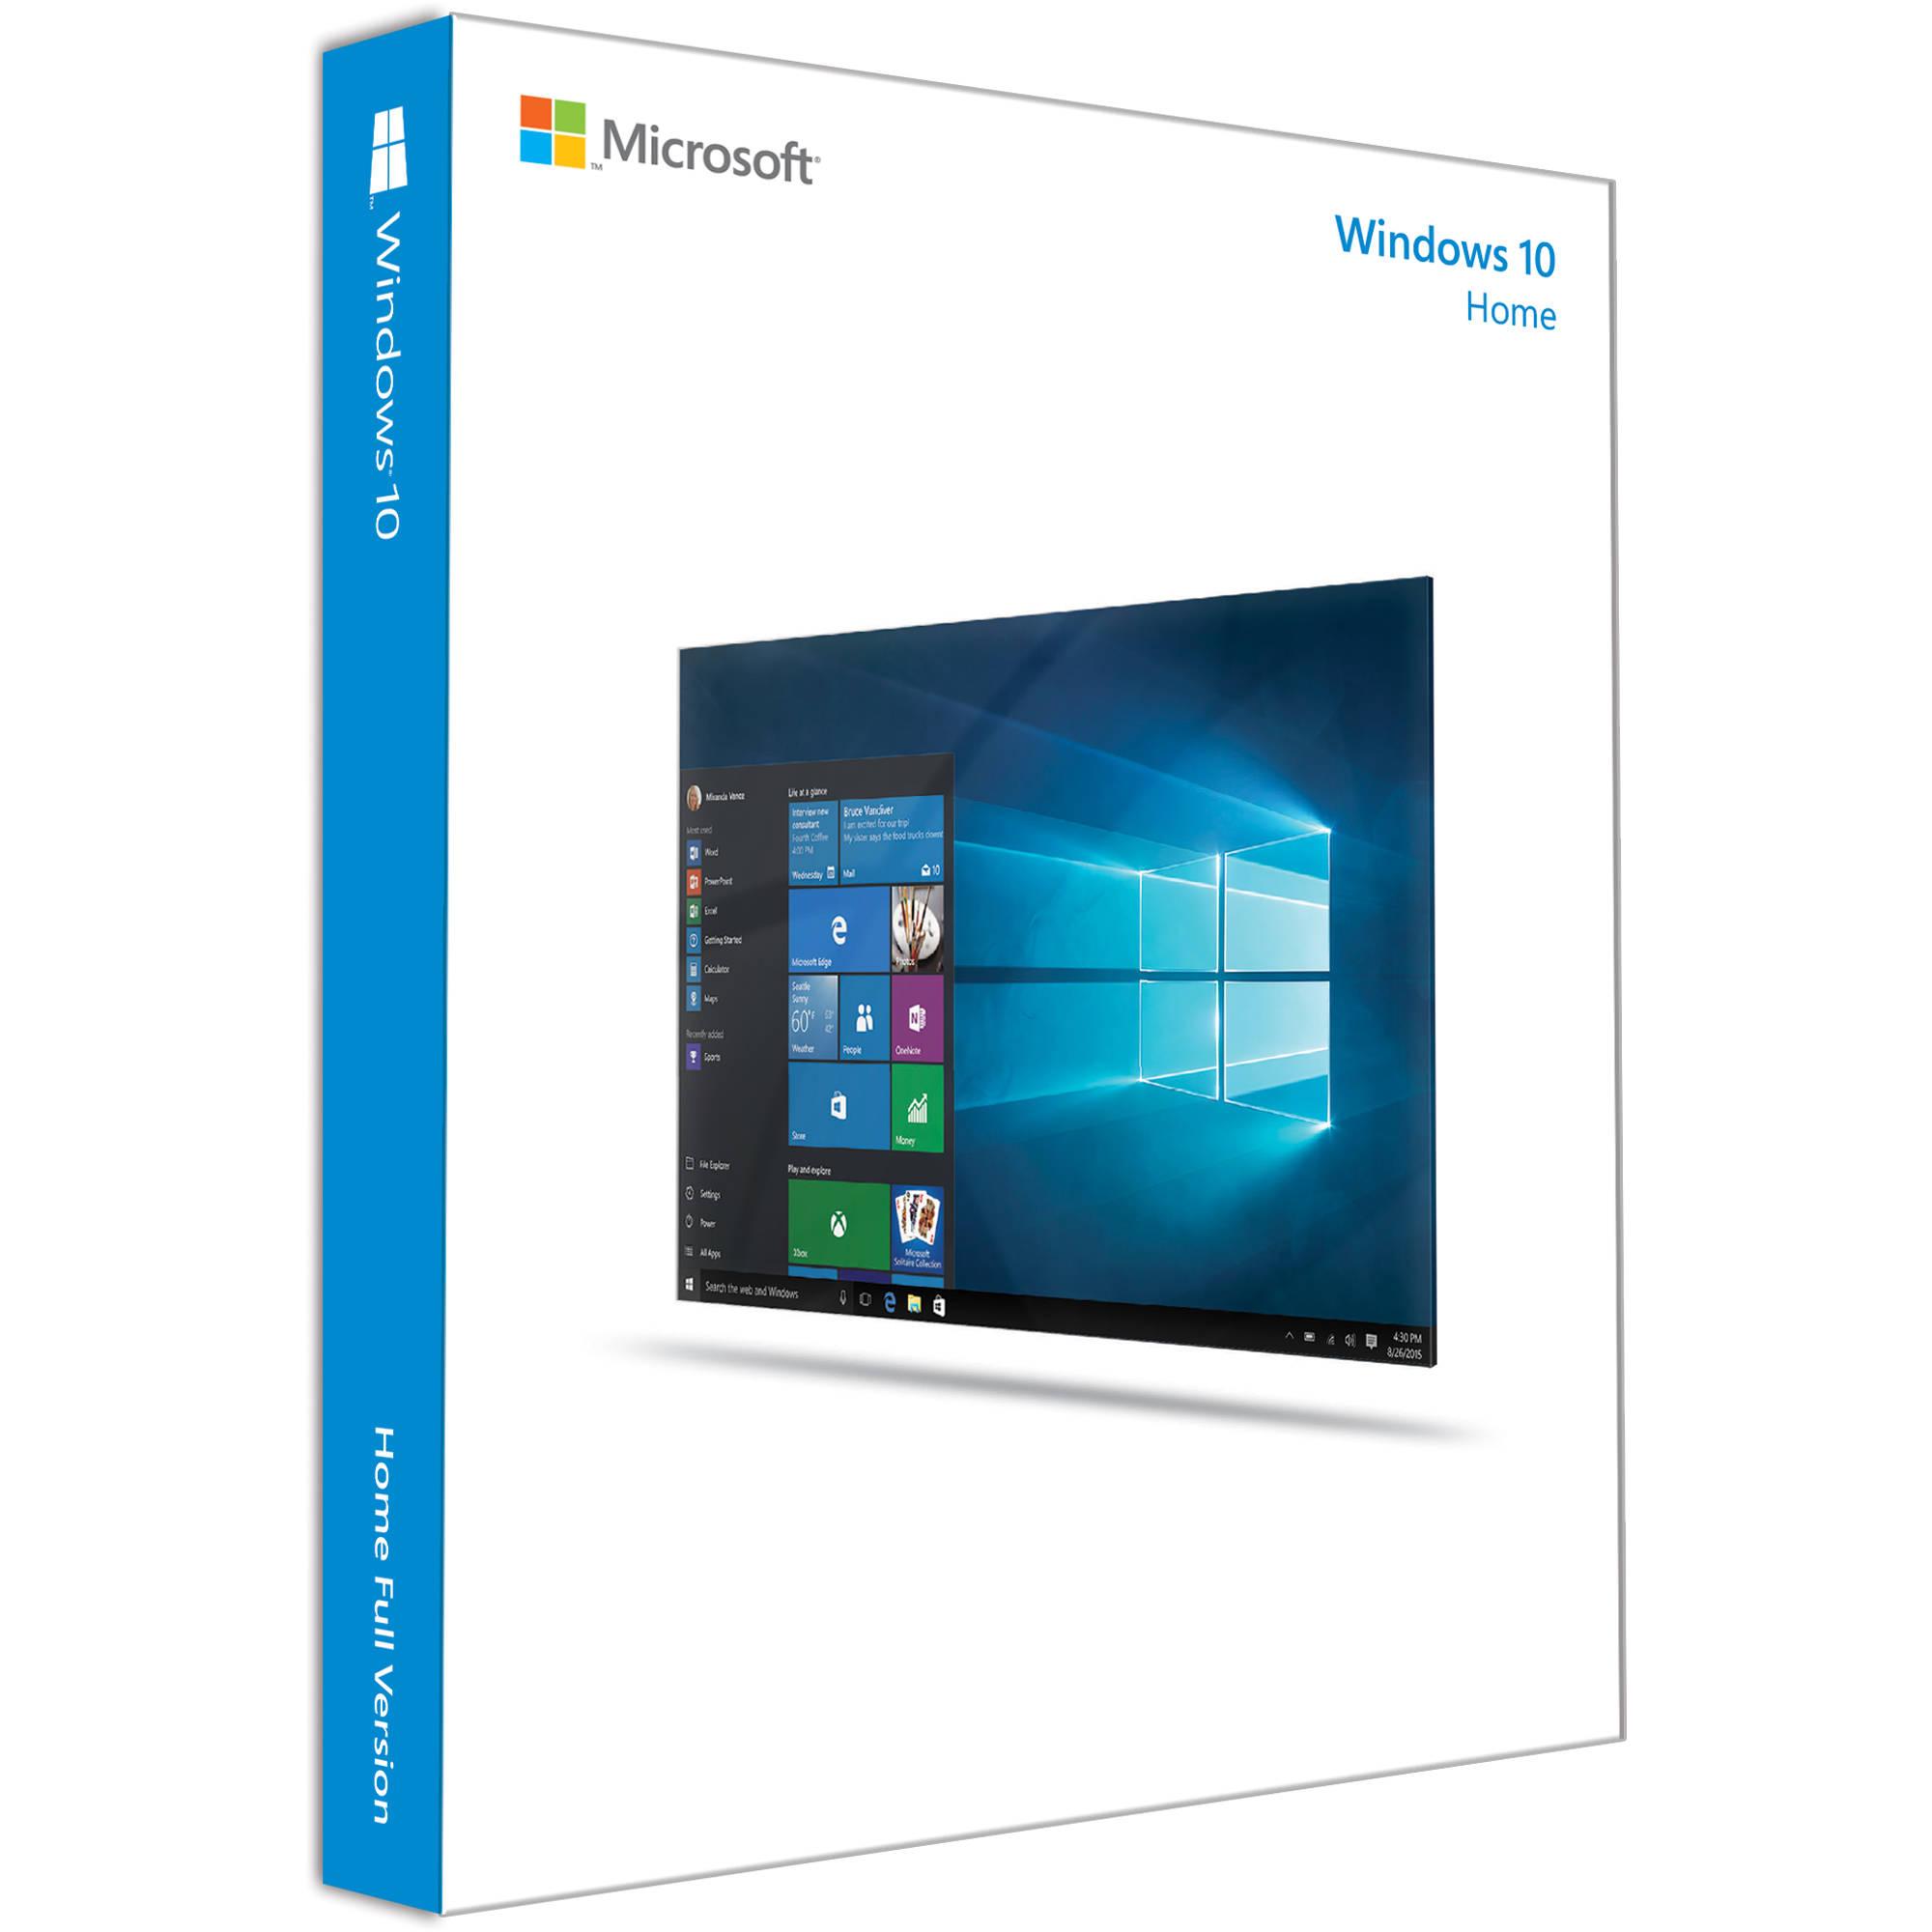 【英語版OS】Microsoft Windows 10 Home<正規品>